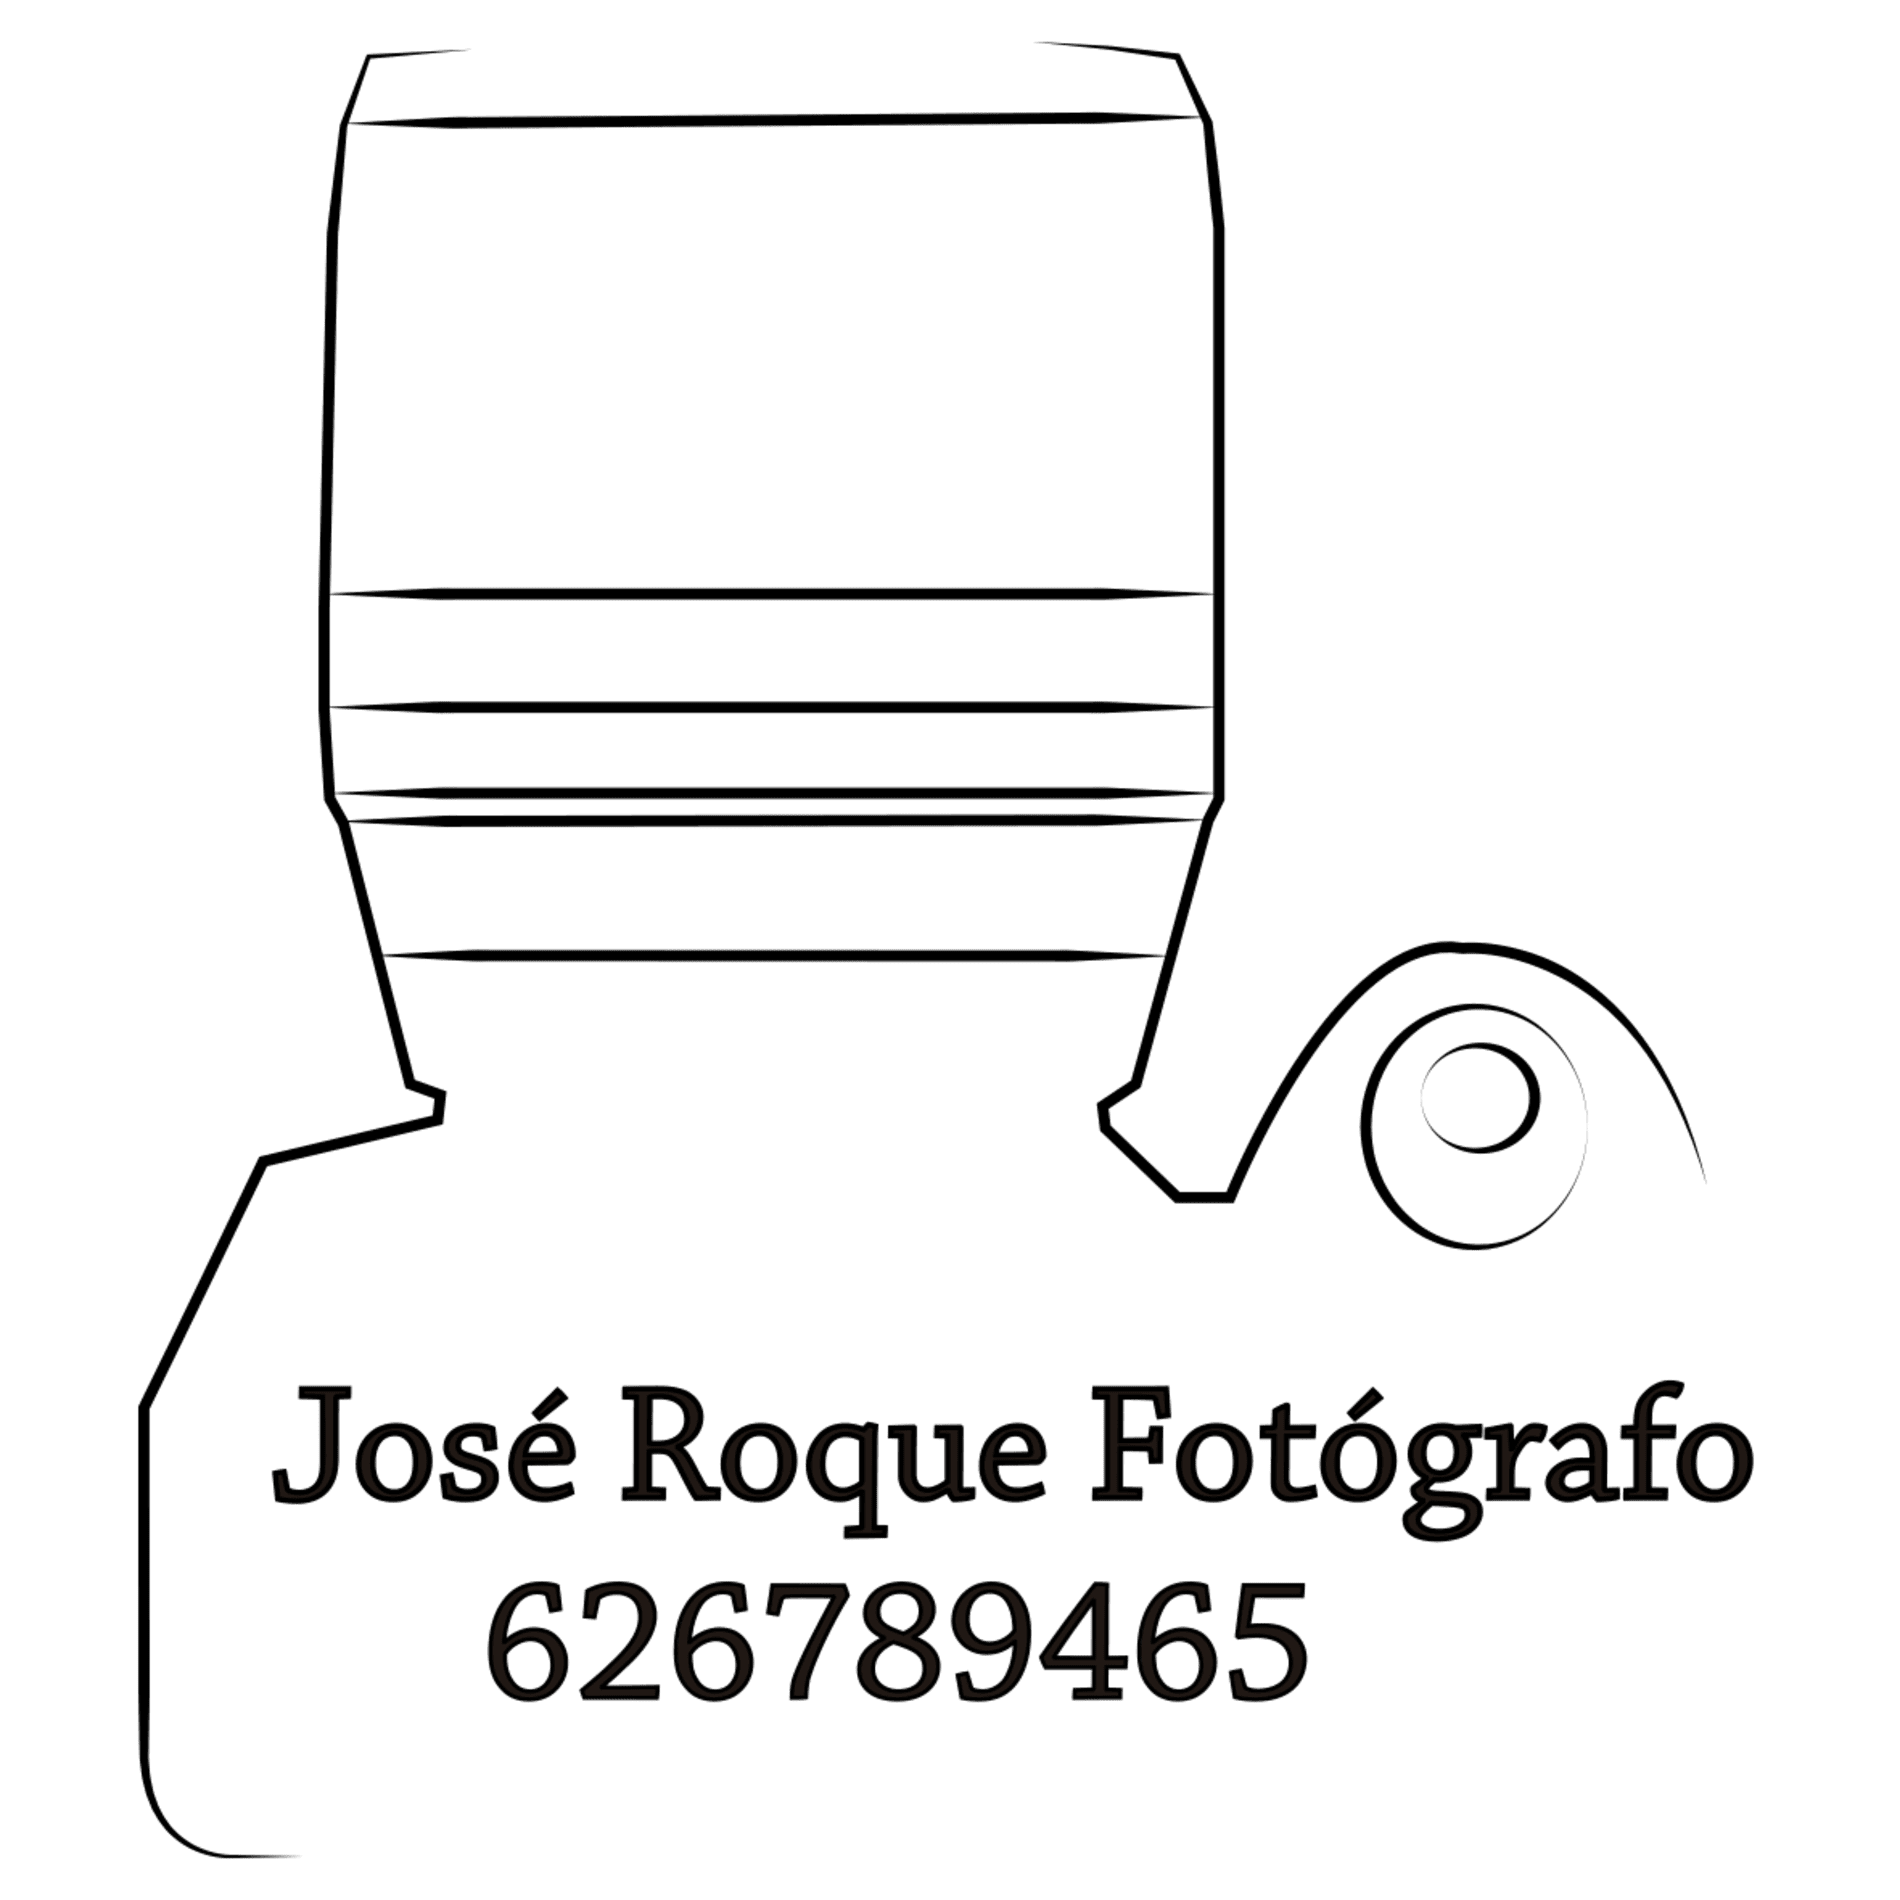 José Roque Fotógrafo